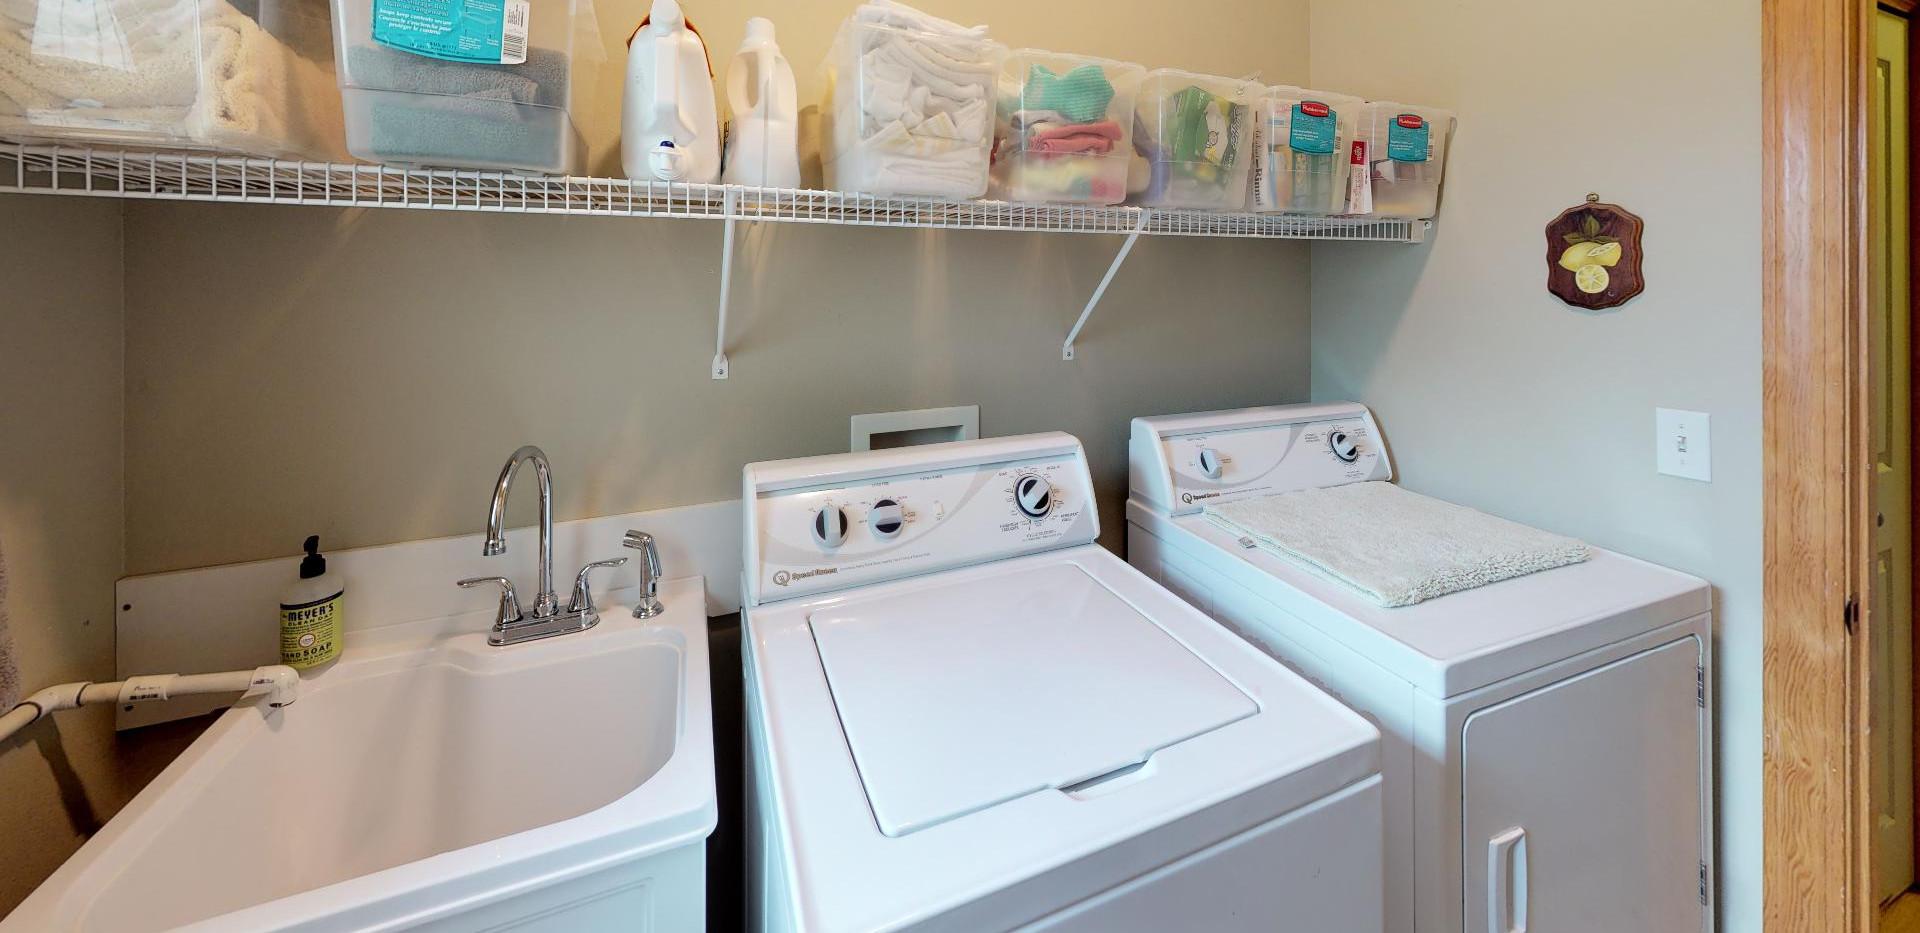 KFr8RyMwd2q - Laundry.jpg